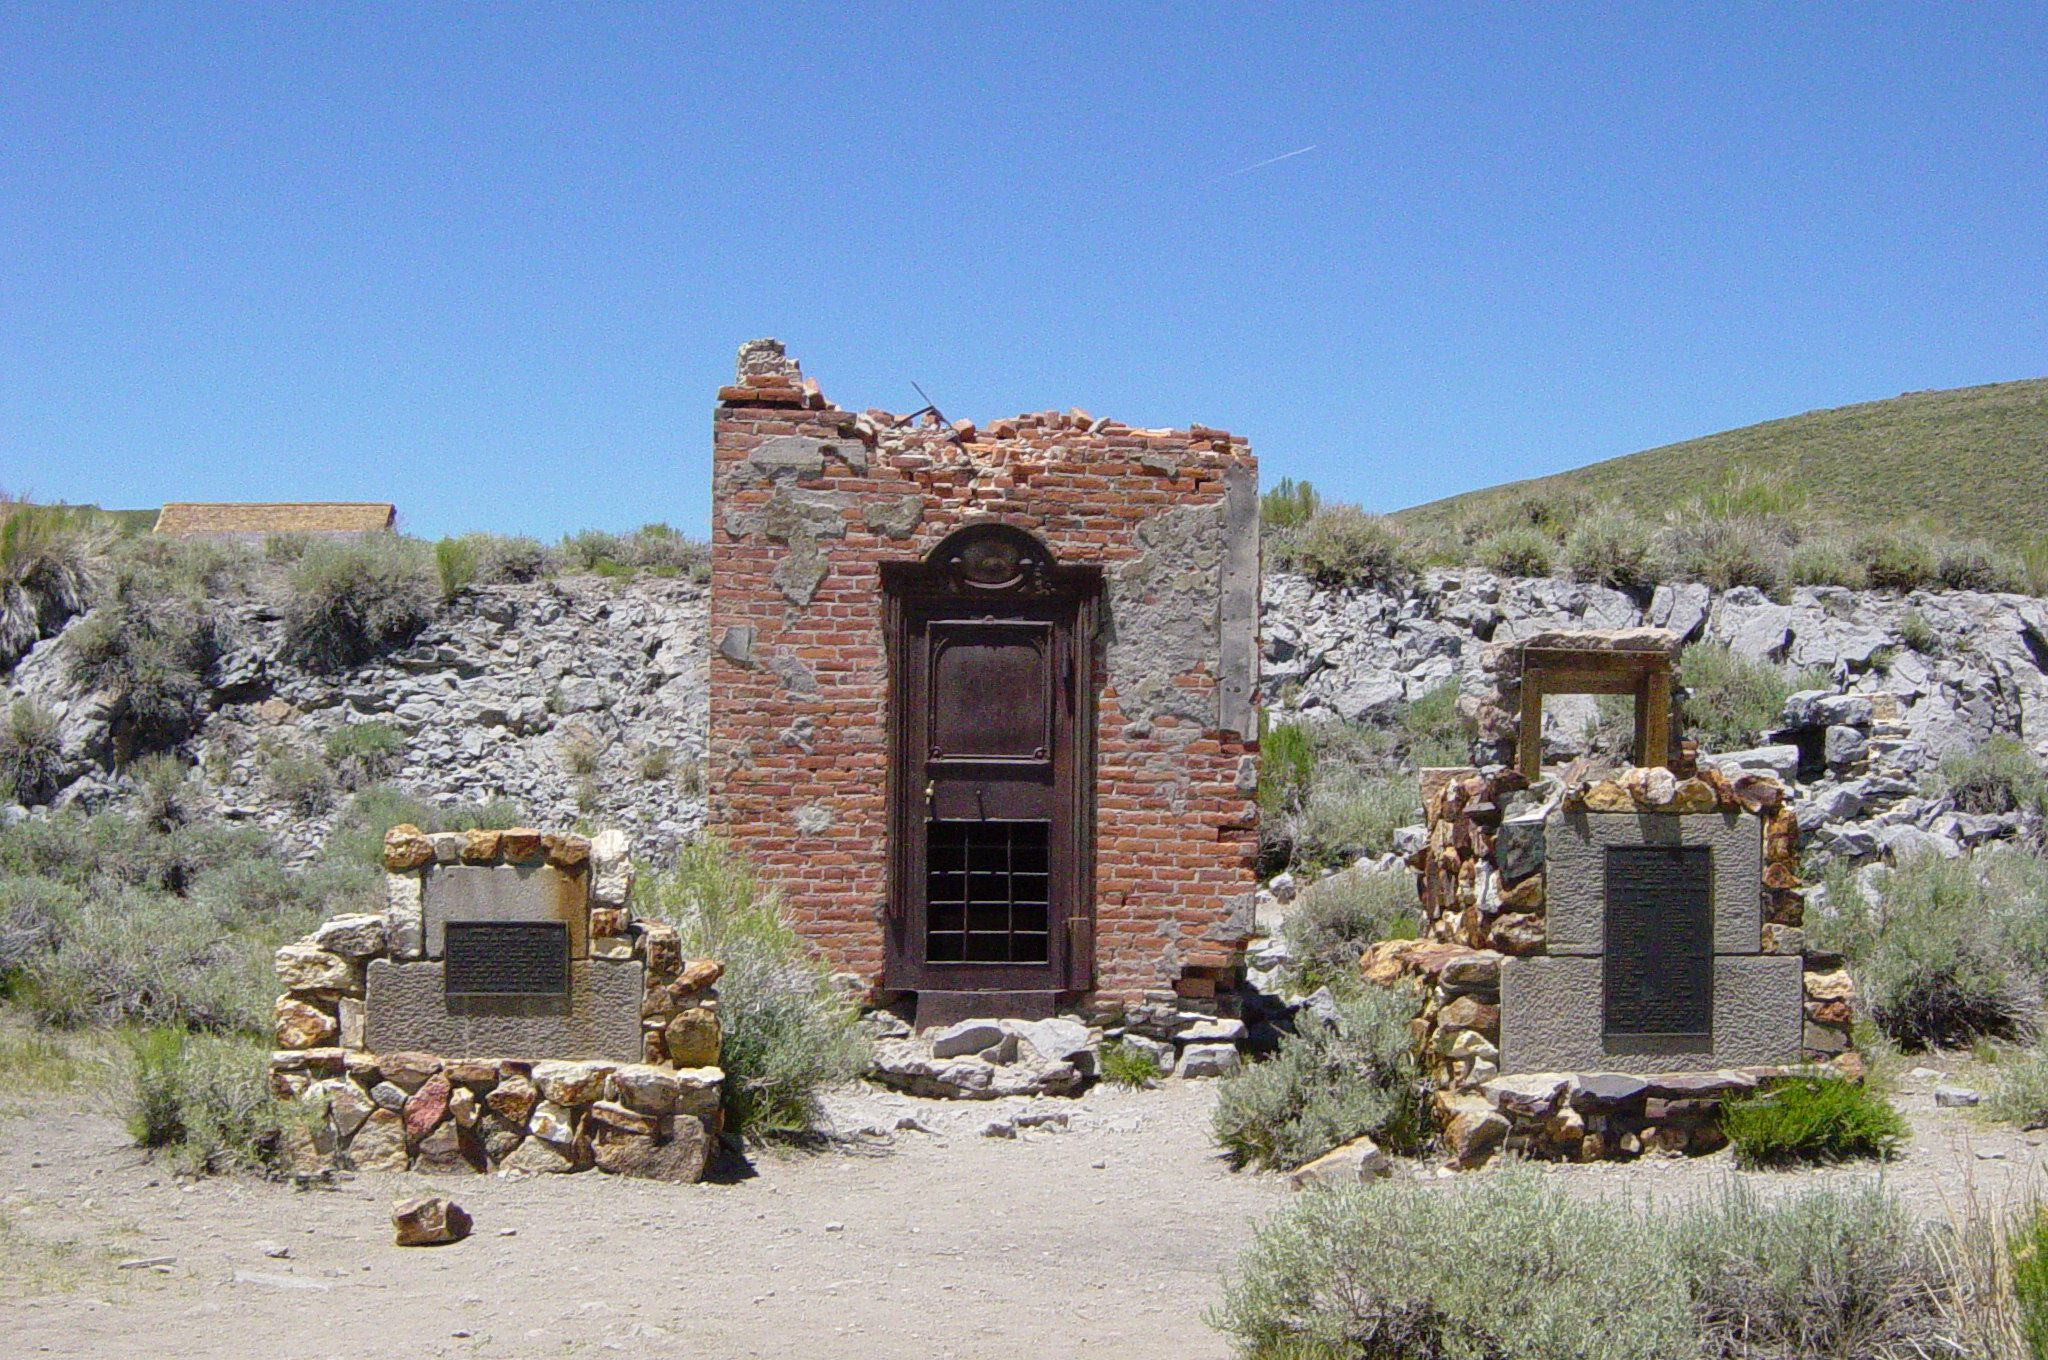 Bodie_Bank_ruins_in_Bodie,_California